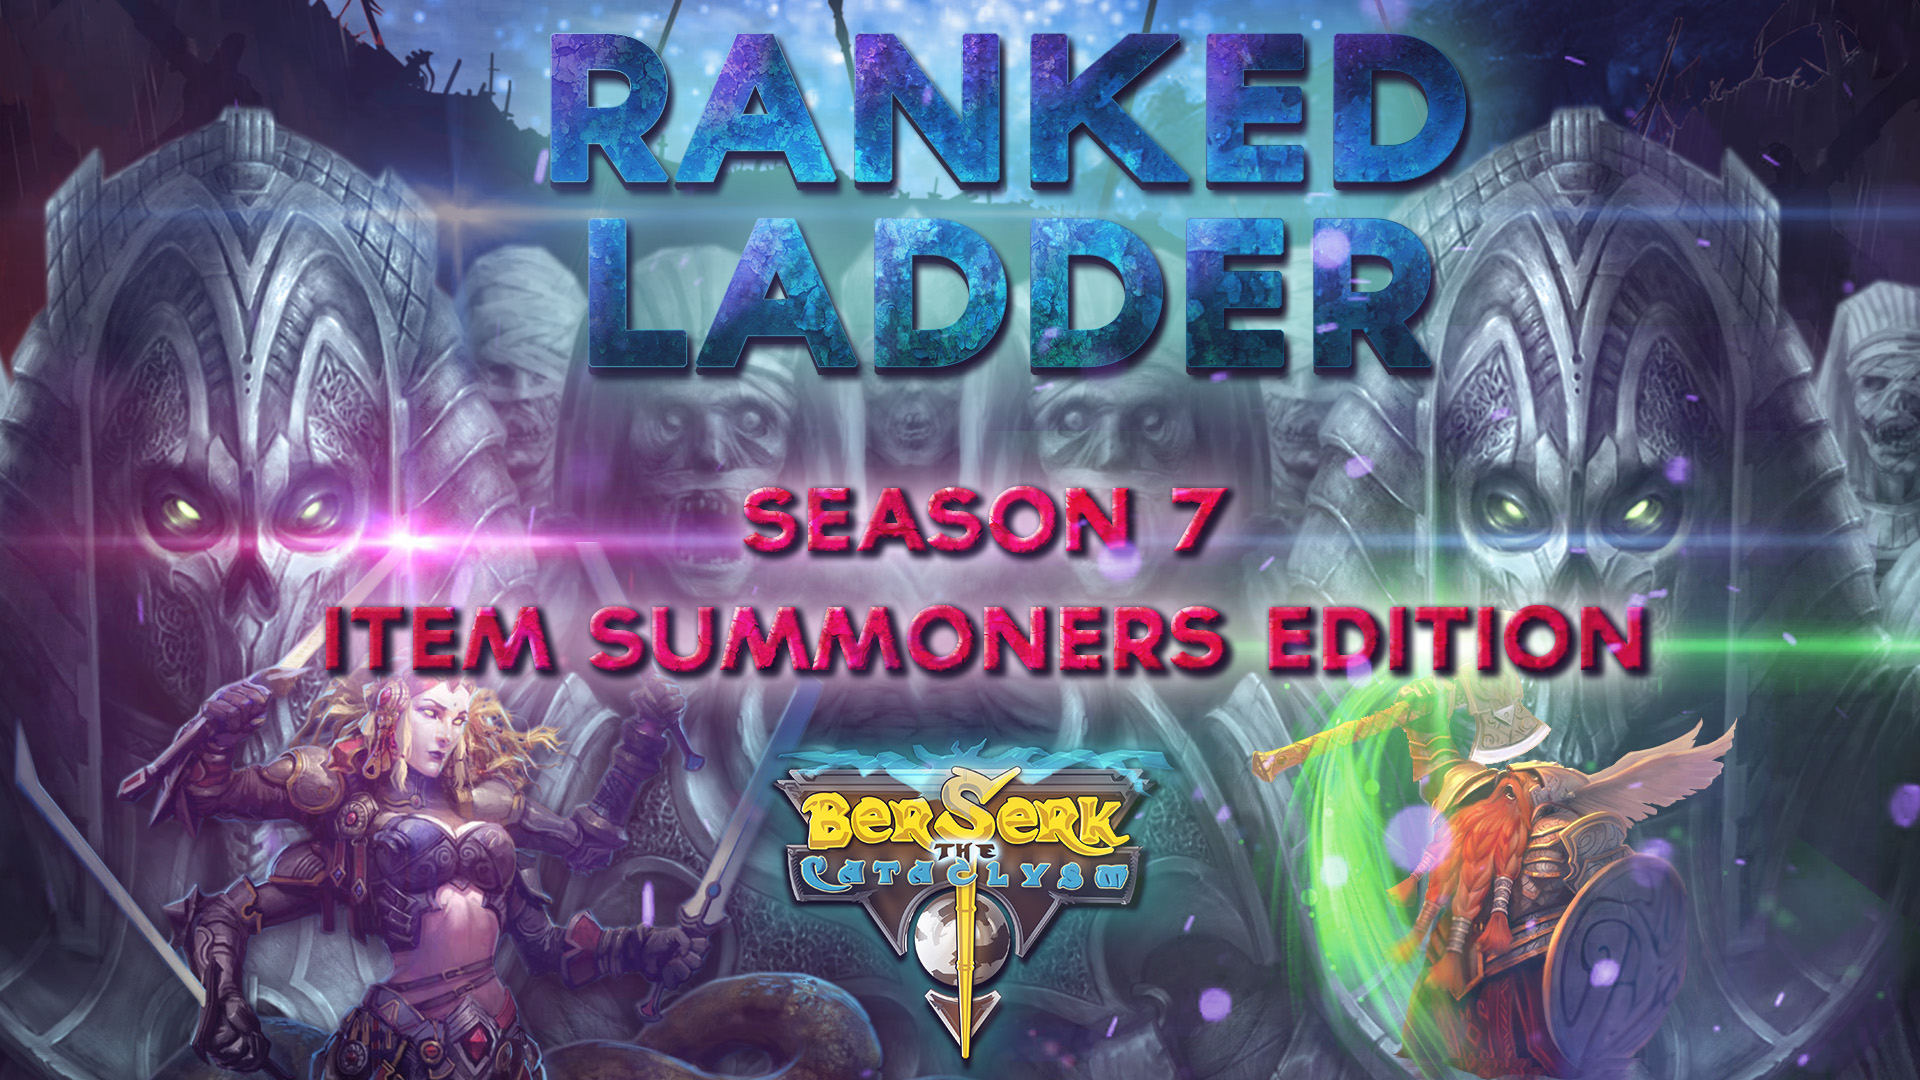 Ranked_LAdder_Season_7_item_summoners.jp